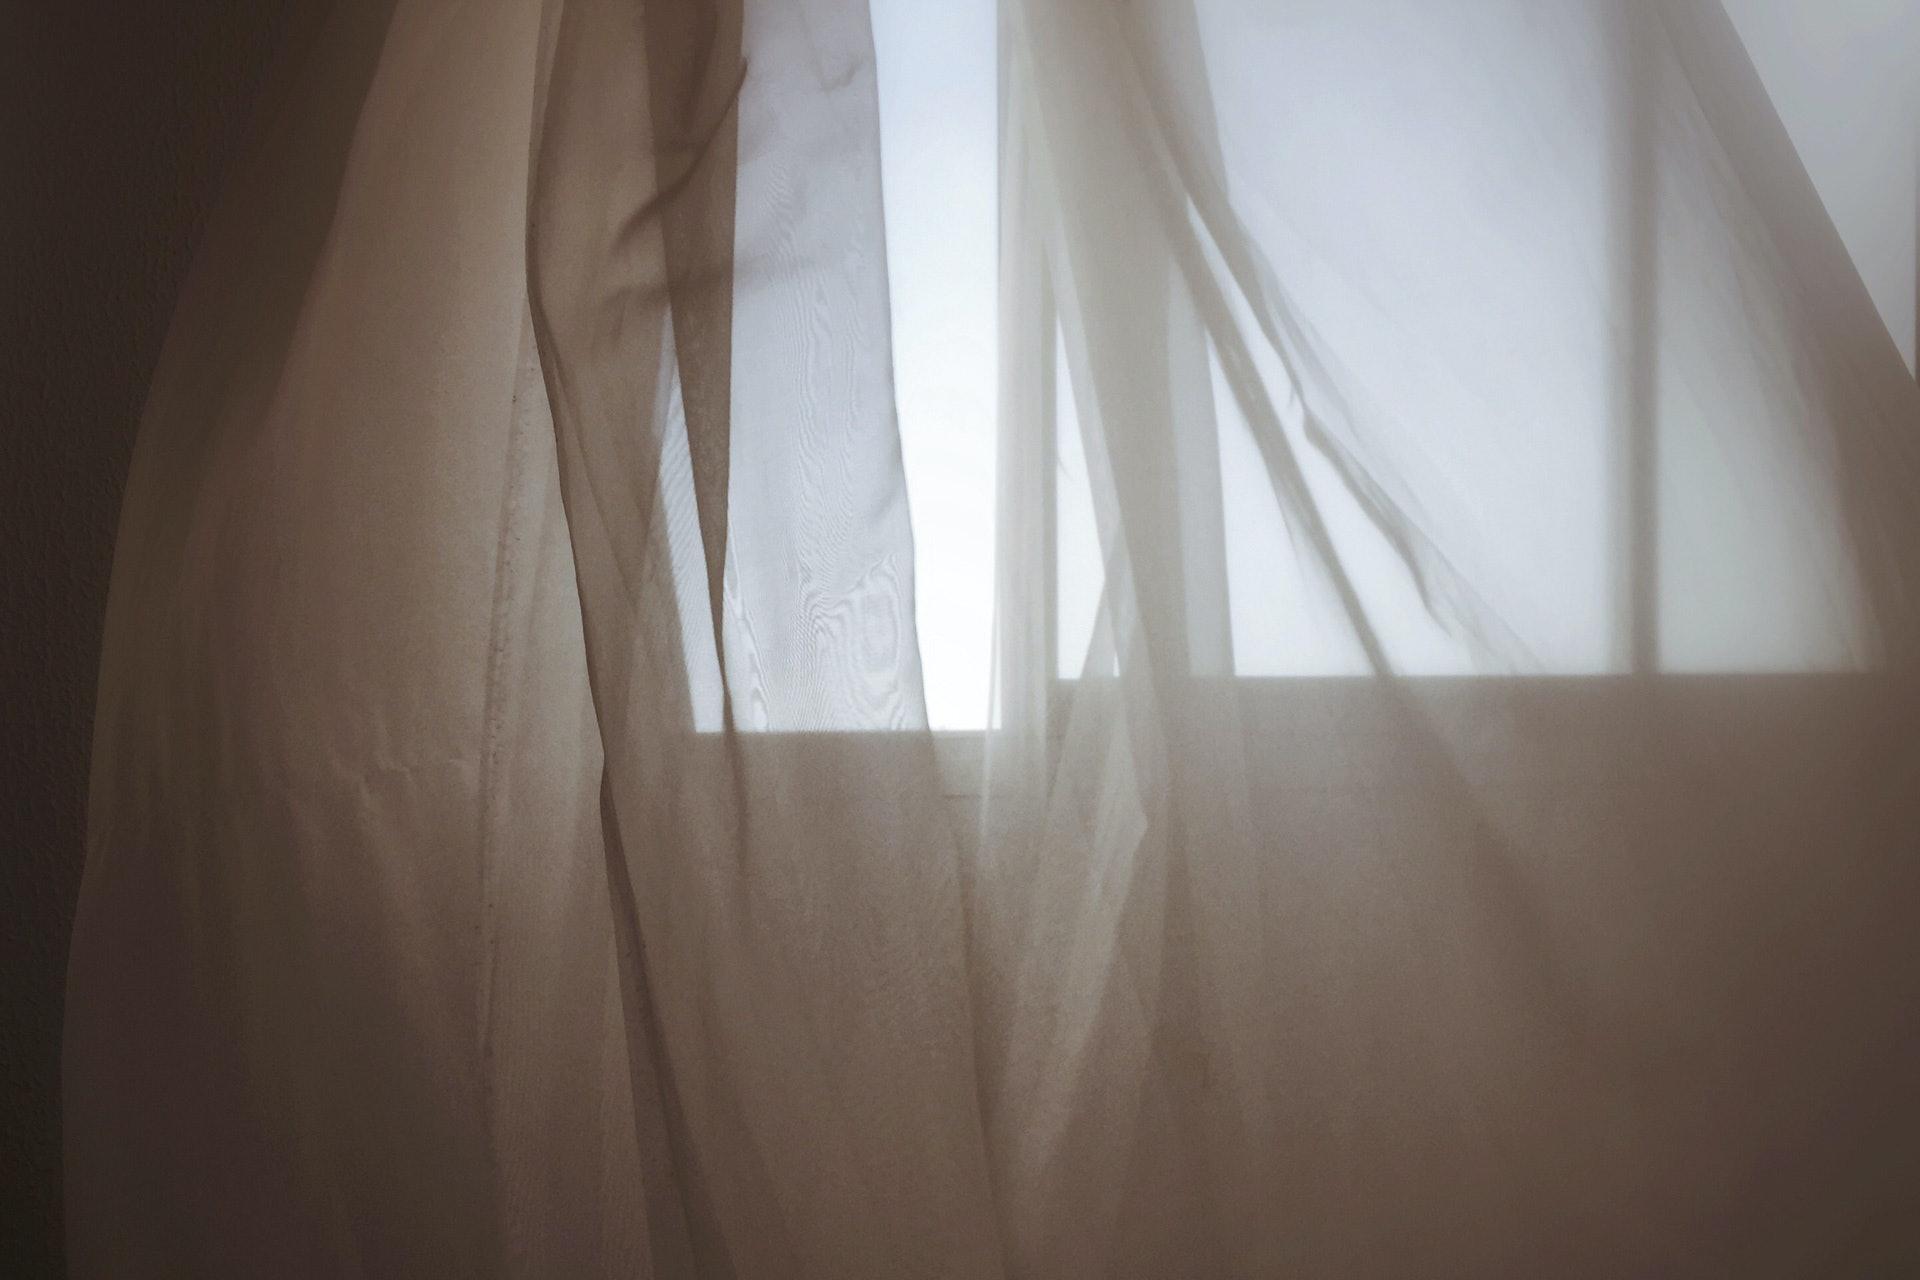 019_Infertility-II_Olga-Boltneva